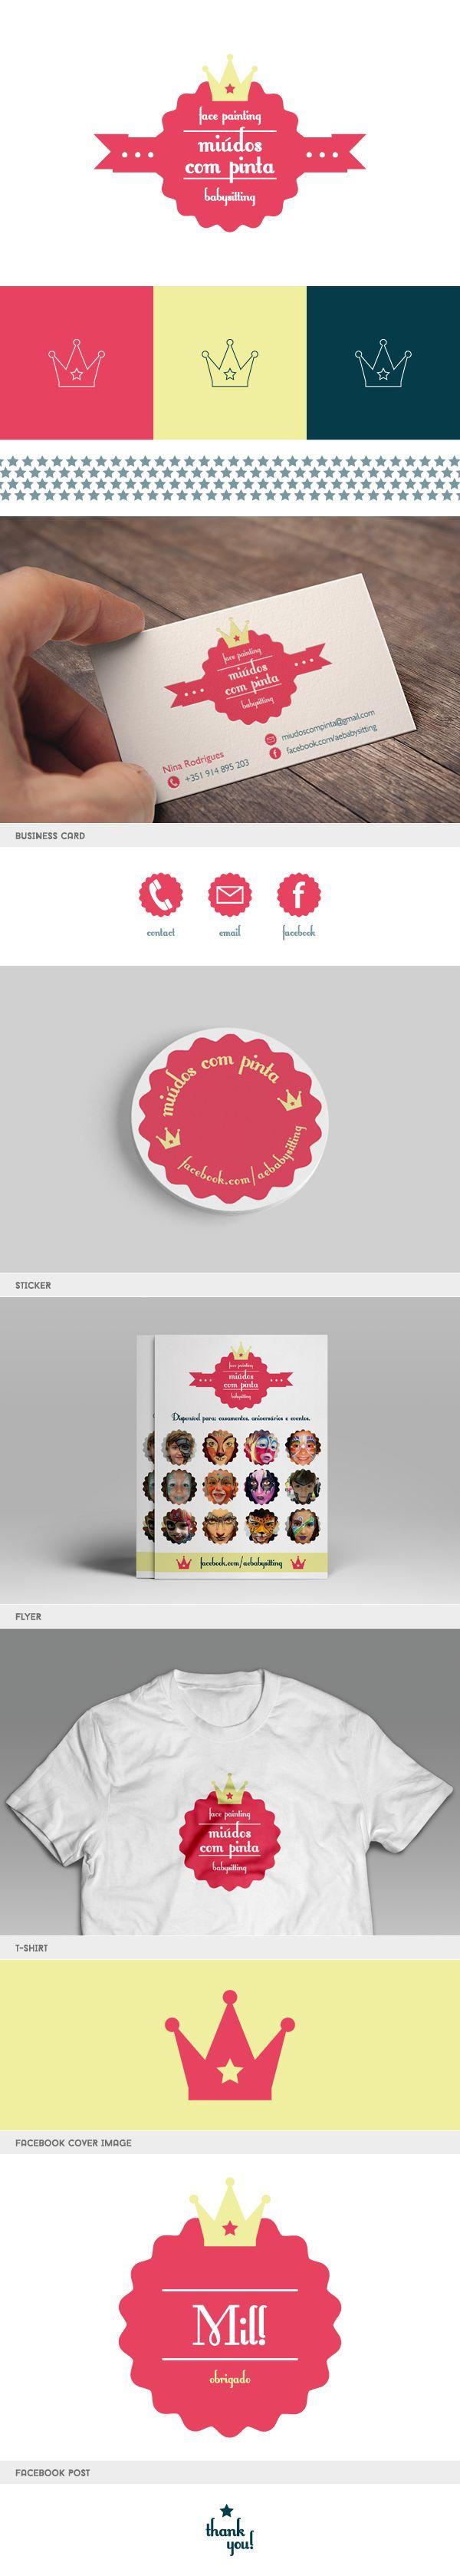 464 best business card designs ✆ images on pinterest